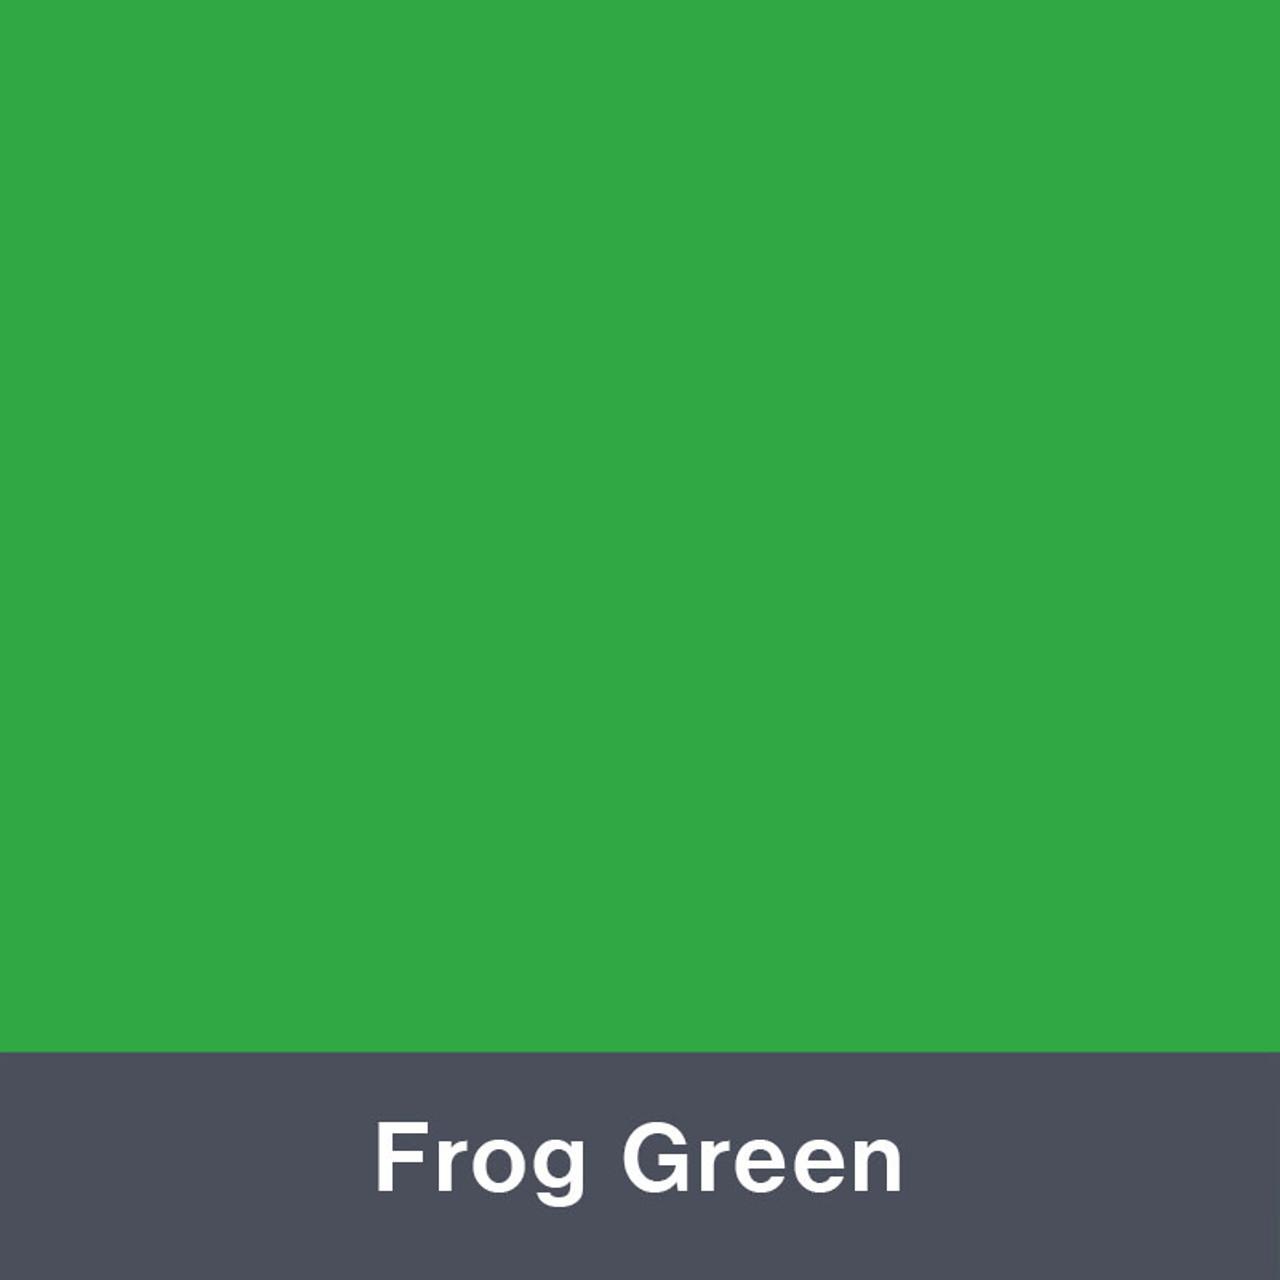 Iron-on Frog Green Turbo 4952